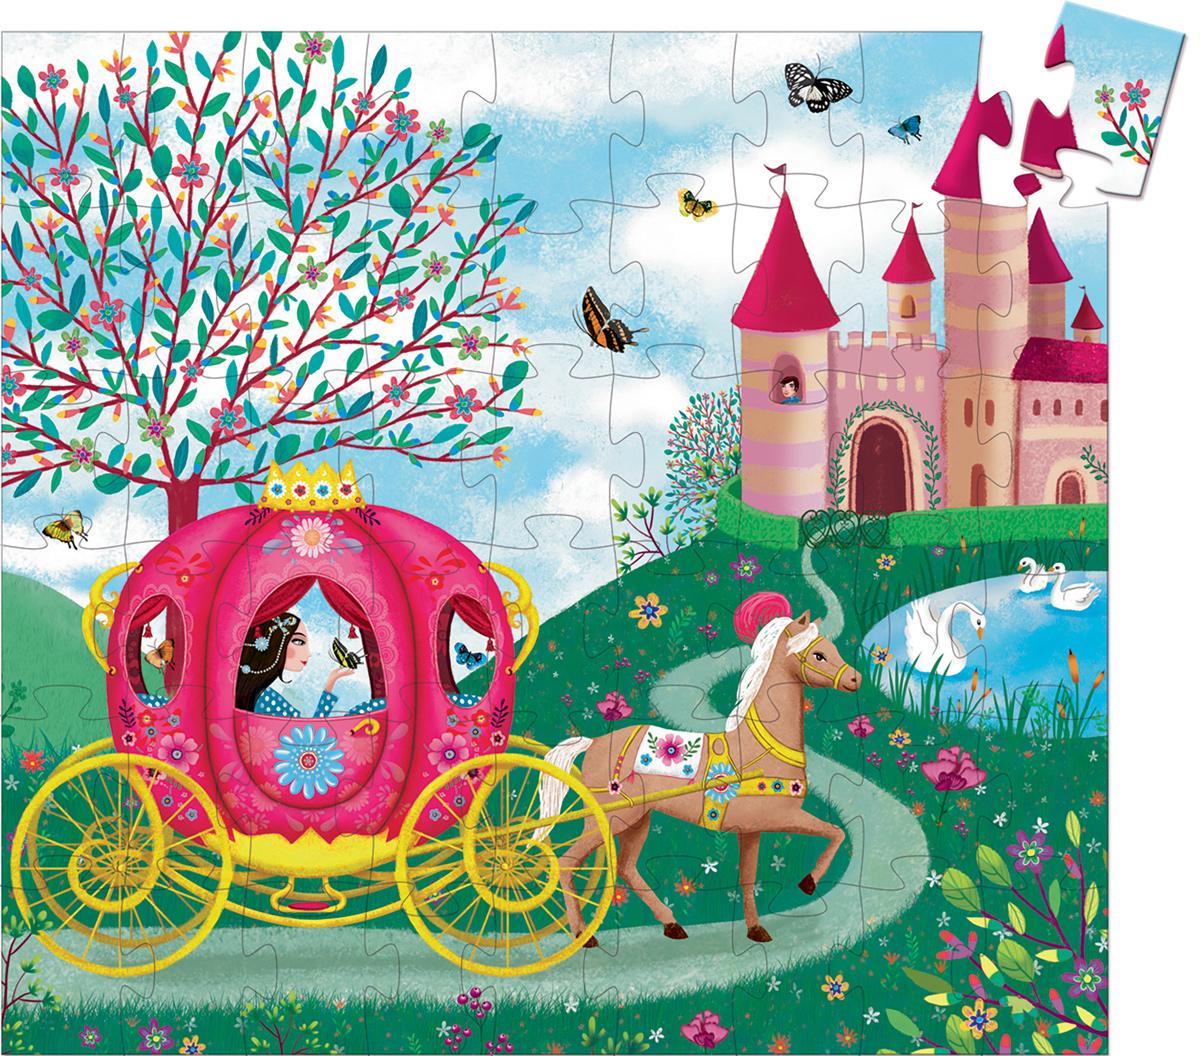 Elise's Carriage Fantasy Jigsaw Puzzle